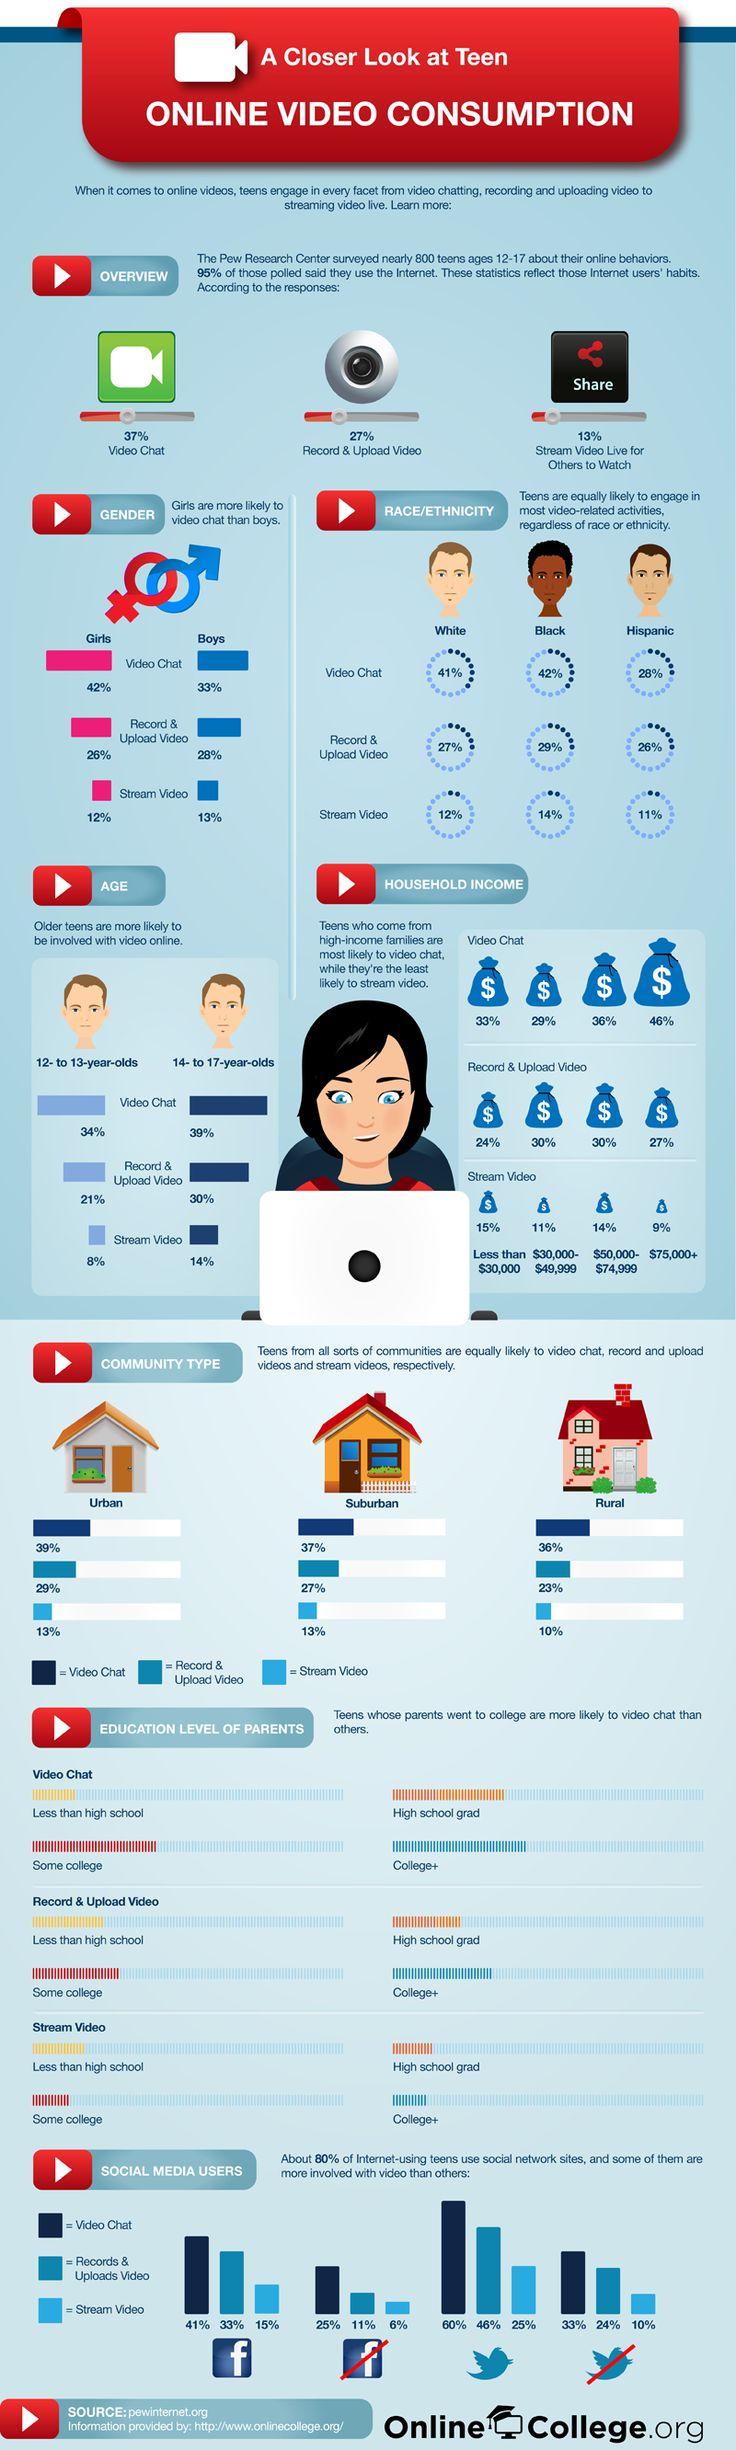 A Closer Look at Teen Online Video Consumption.